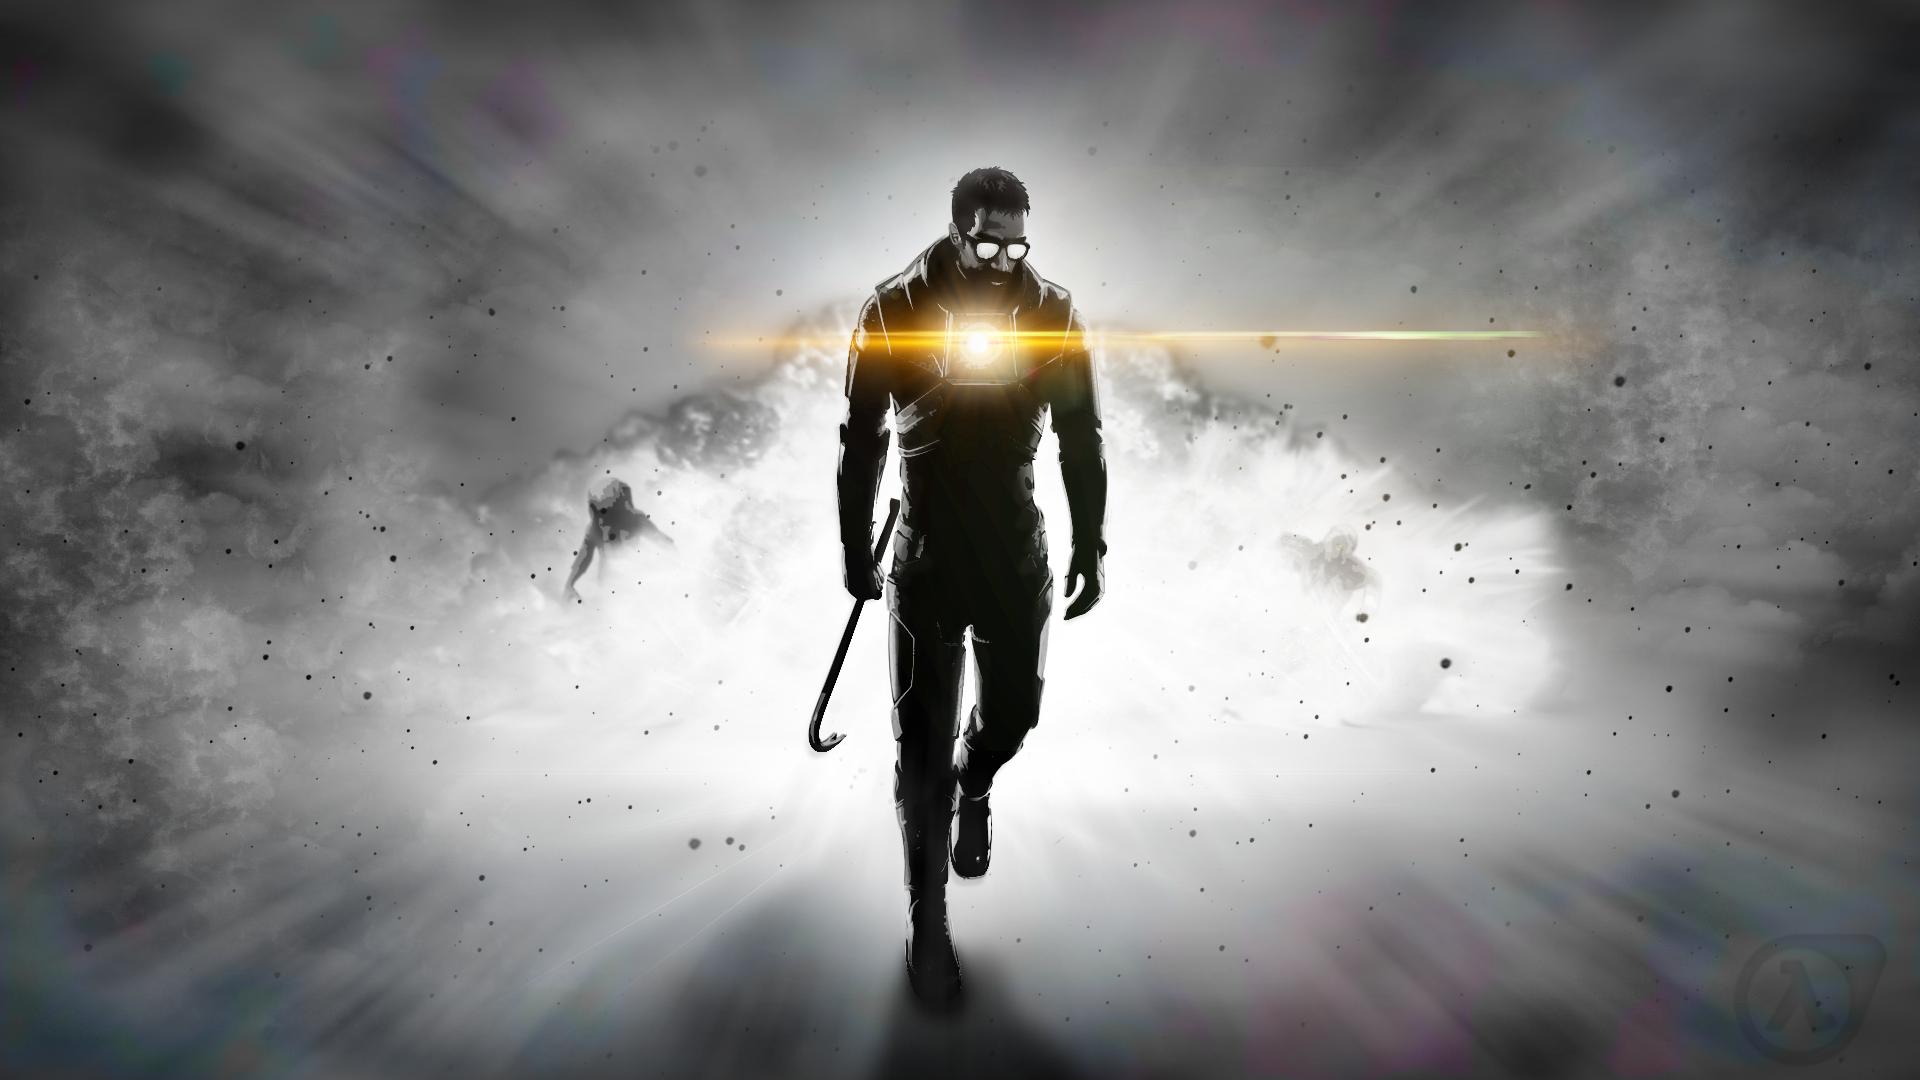 Wallpaper Half Life Valve Corporation Gordon Freeman